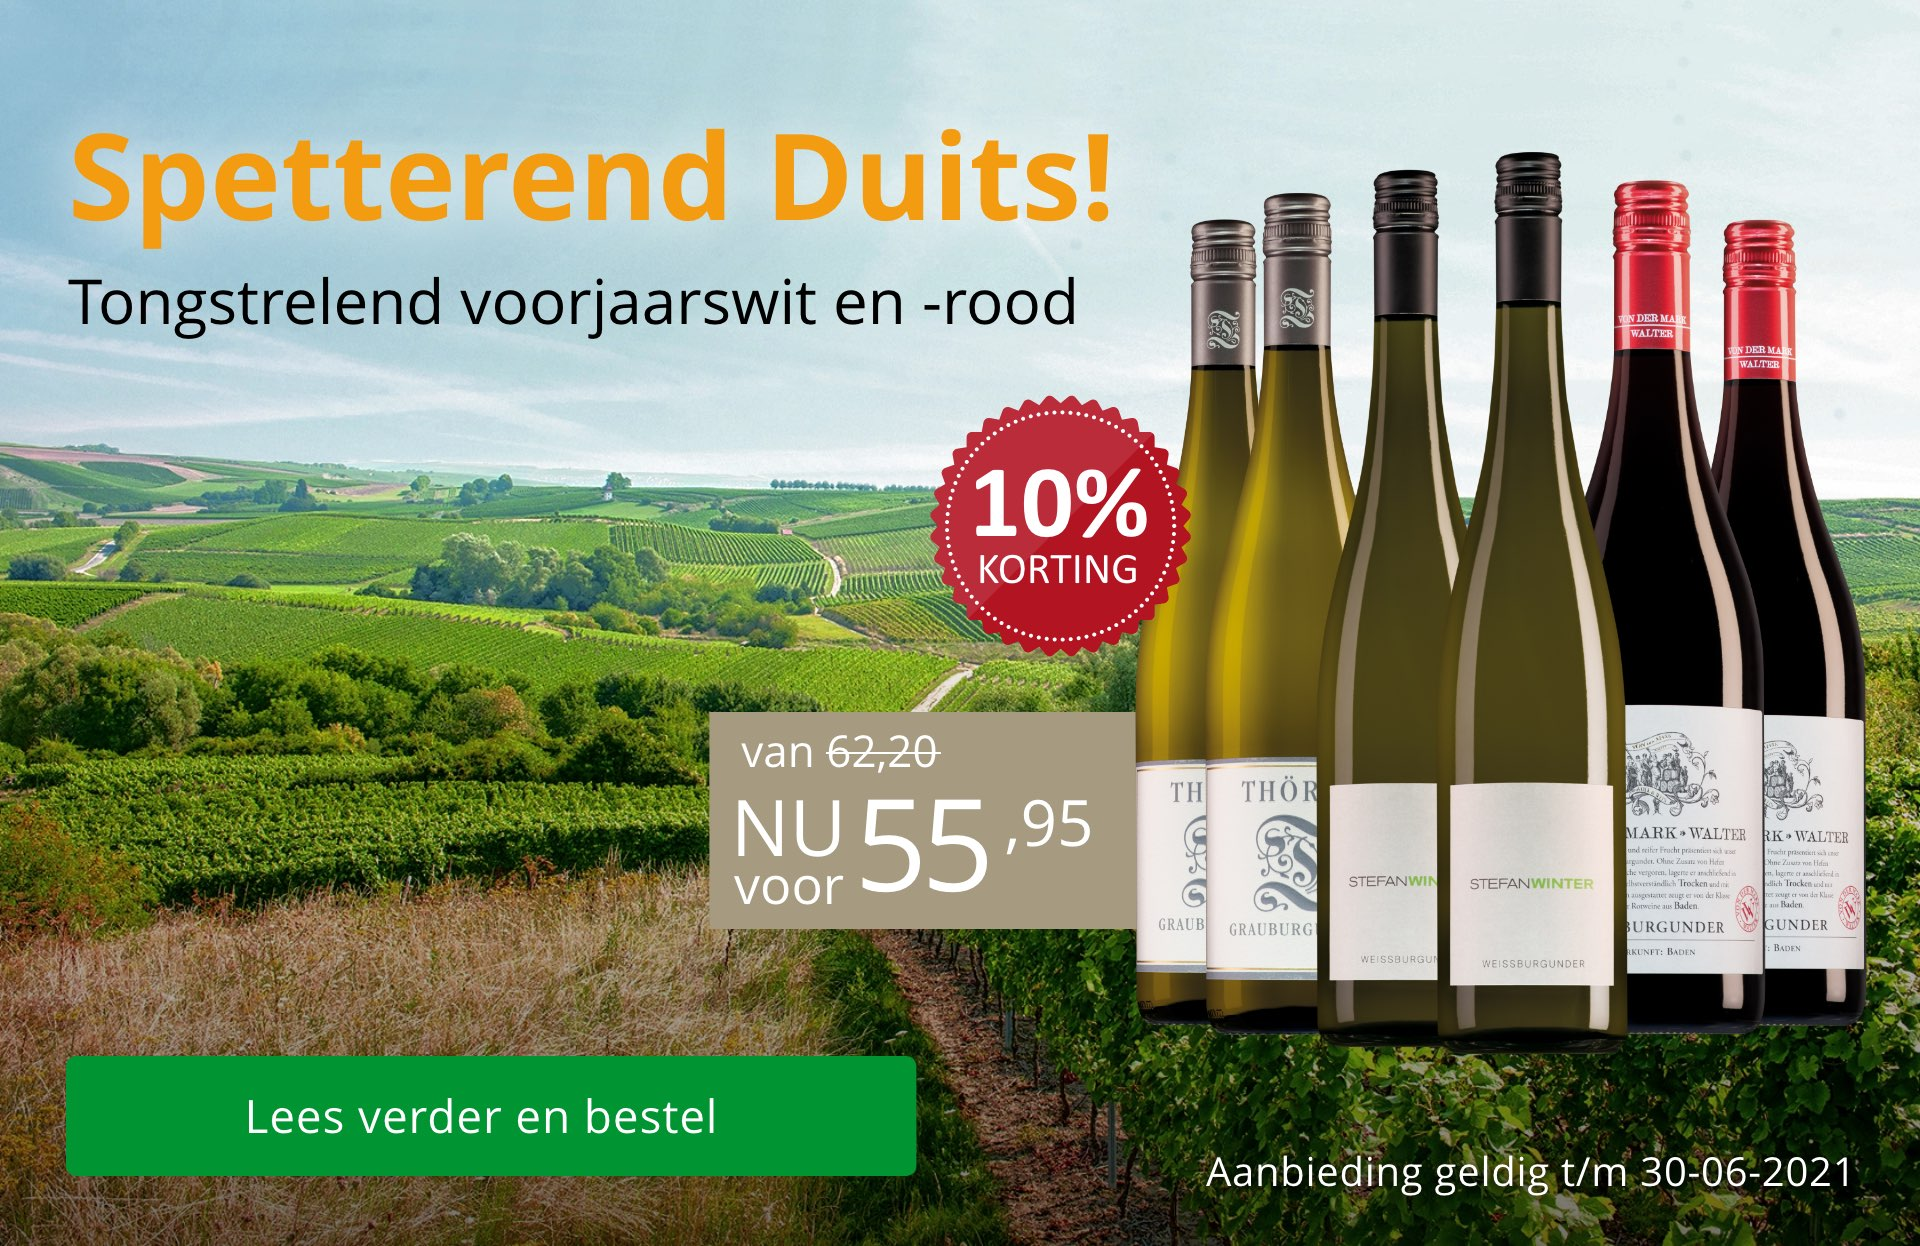 Spetterend Duits wijnpakket